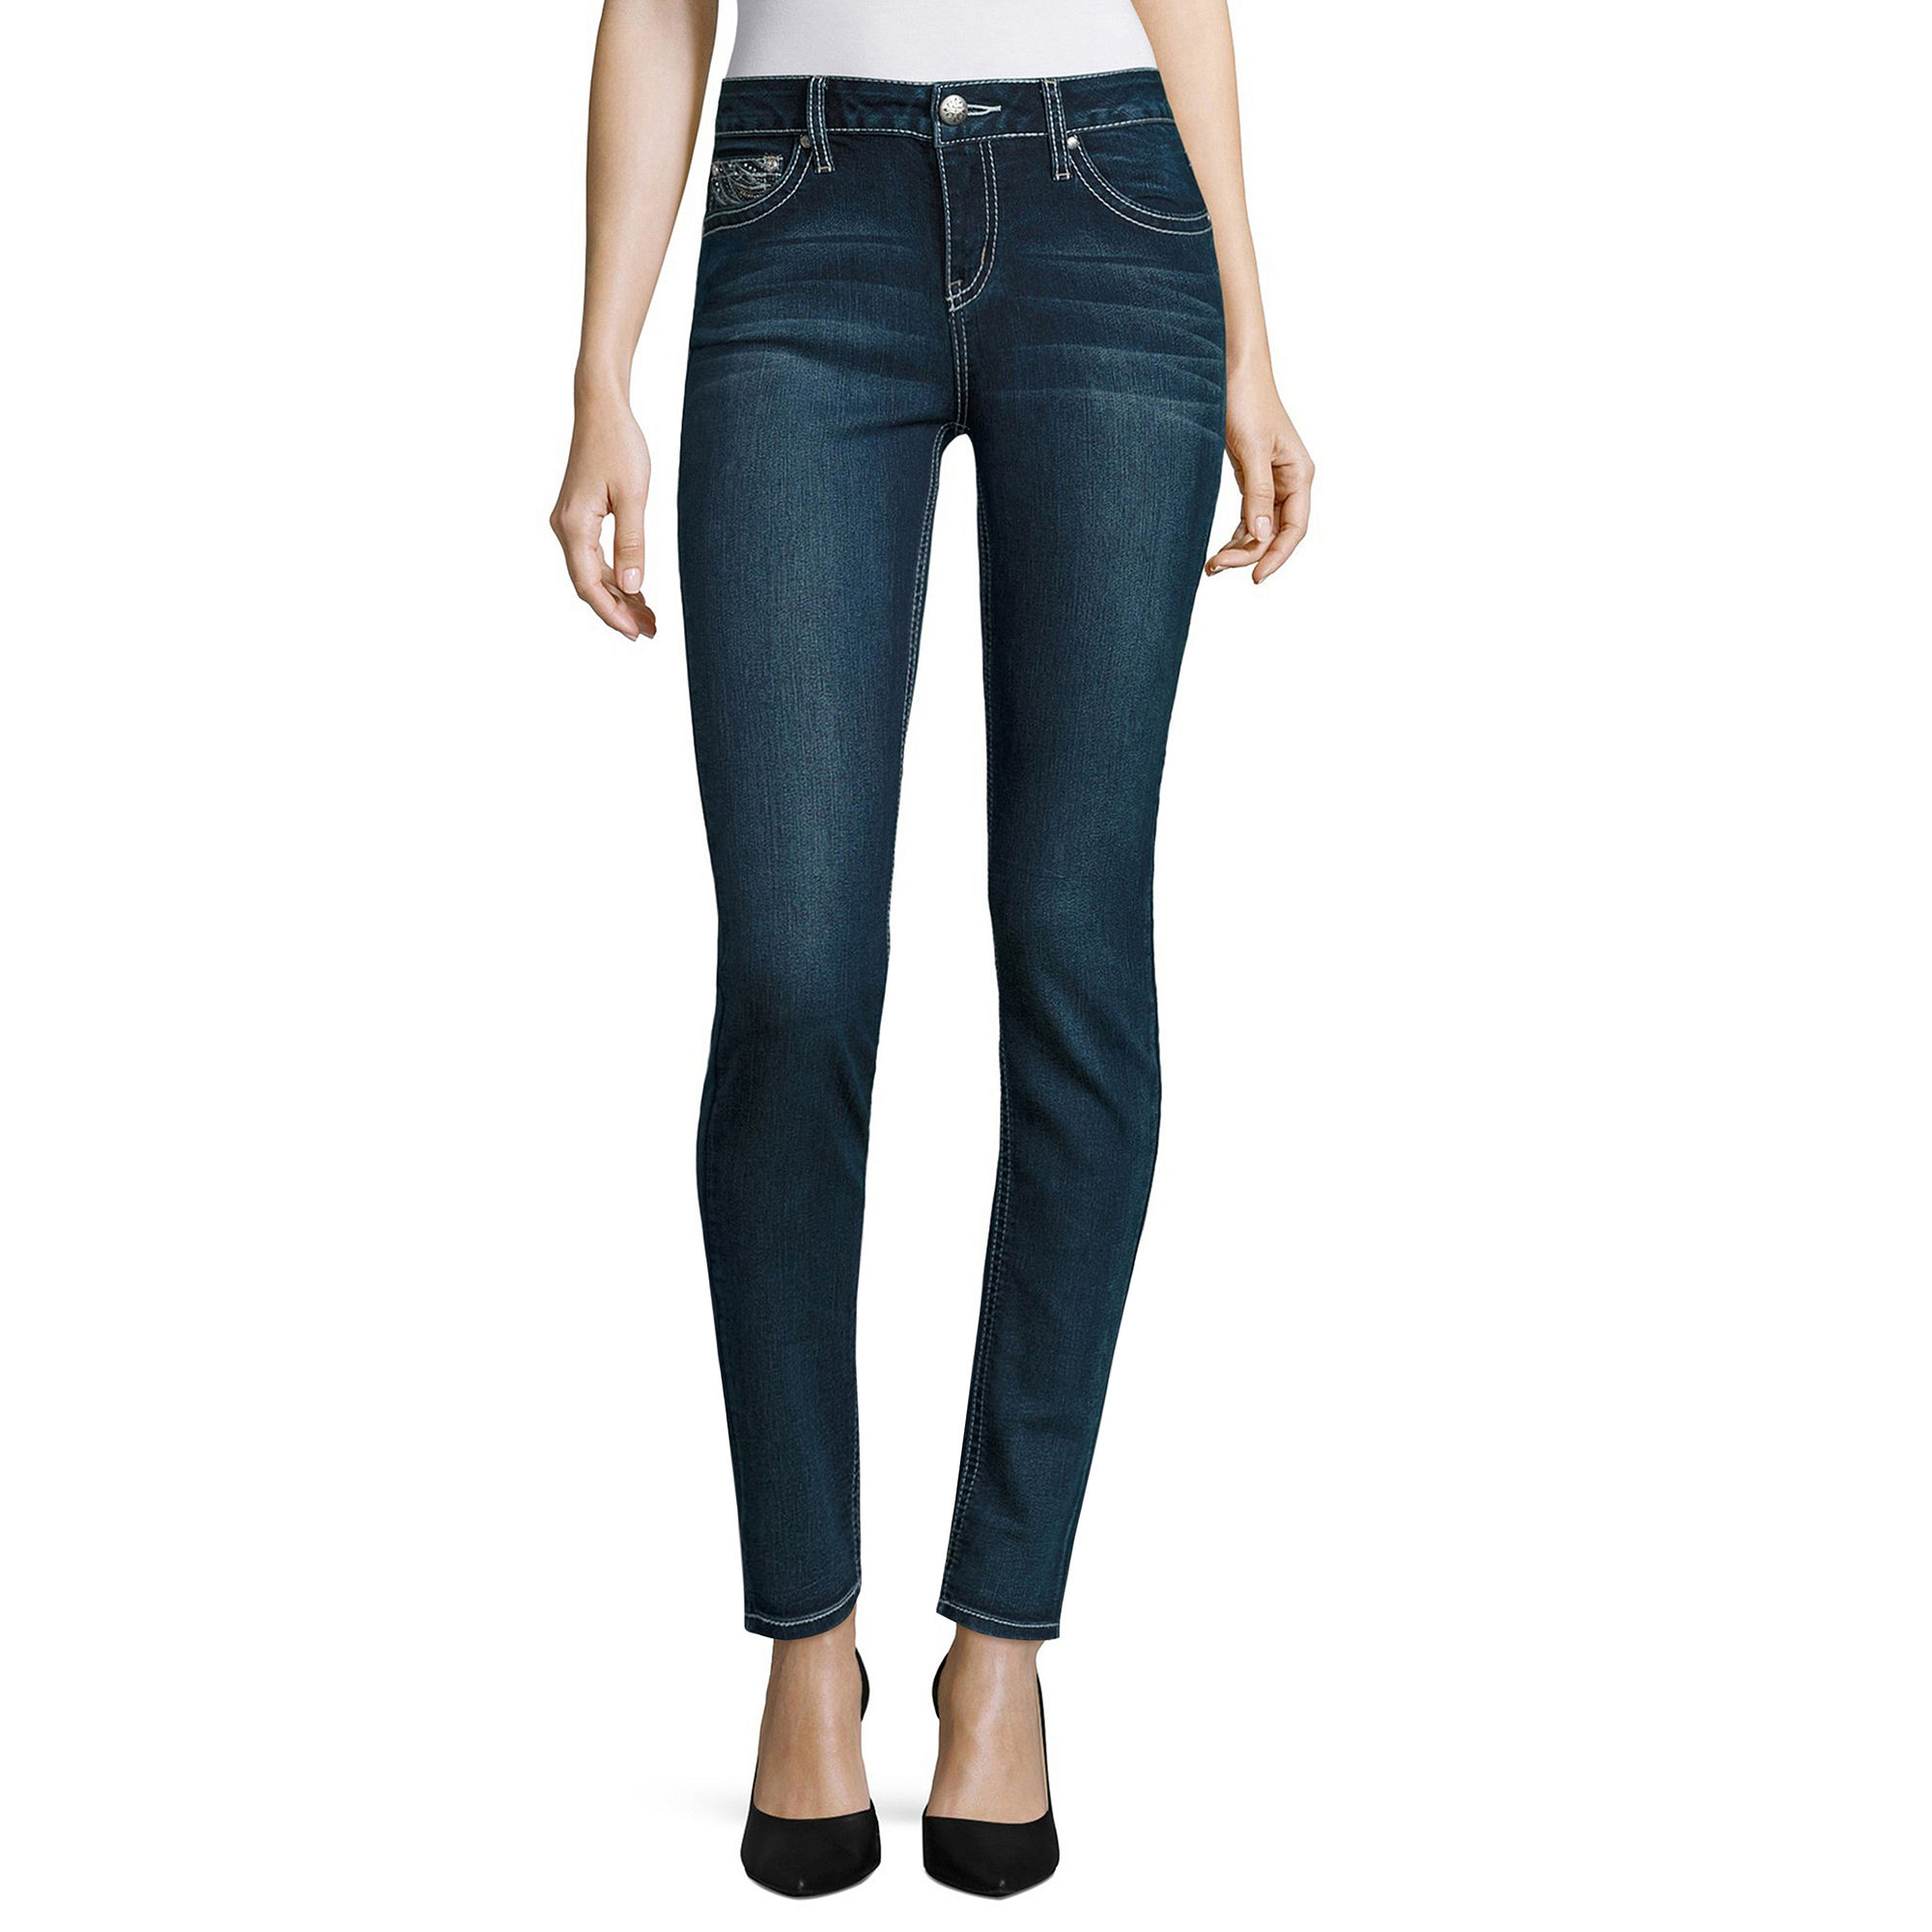 Zco Jeans Skinny Jeans-Juniors